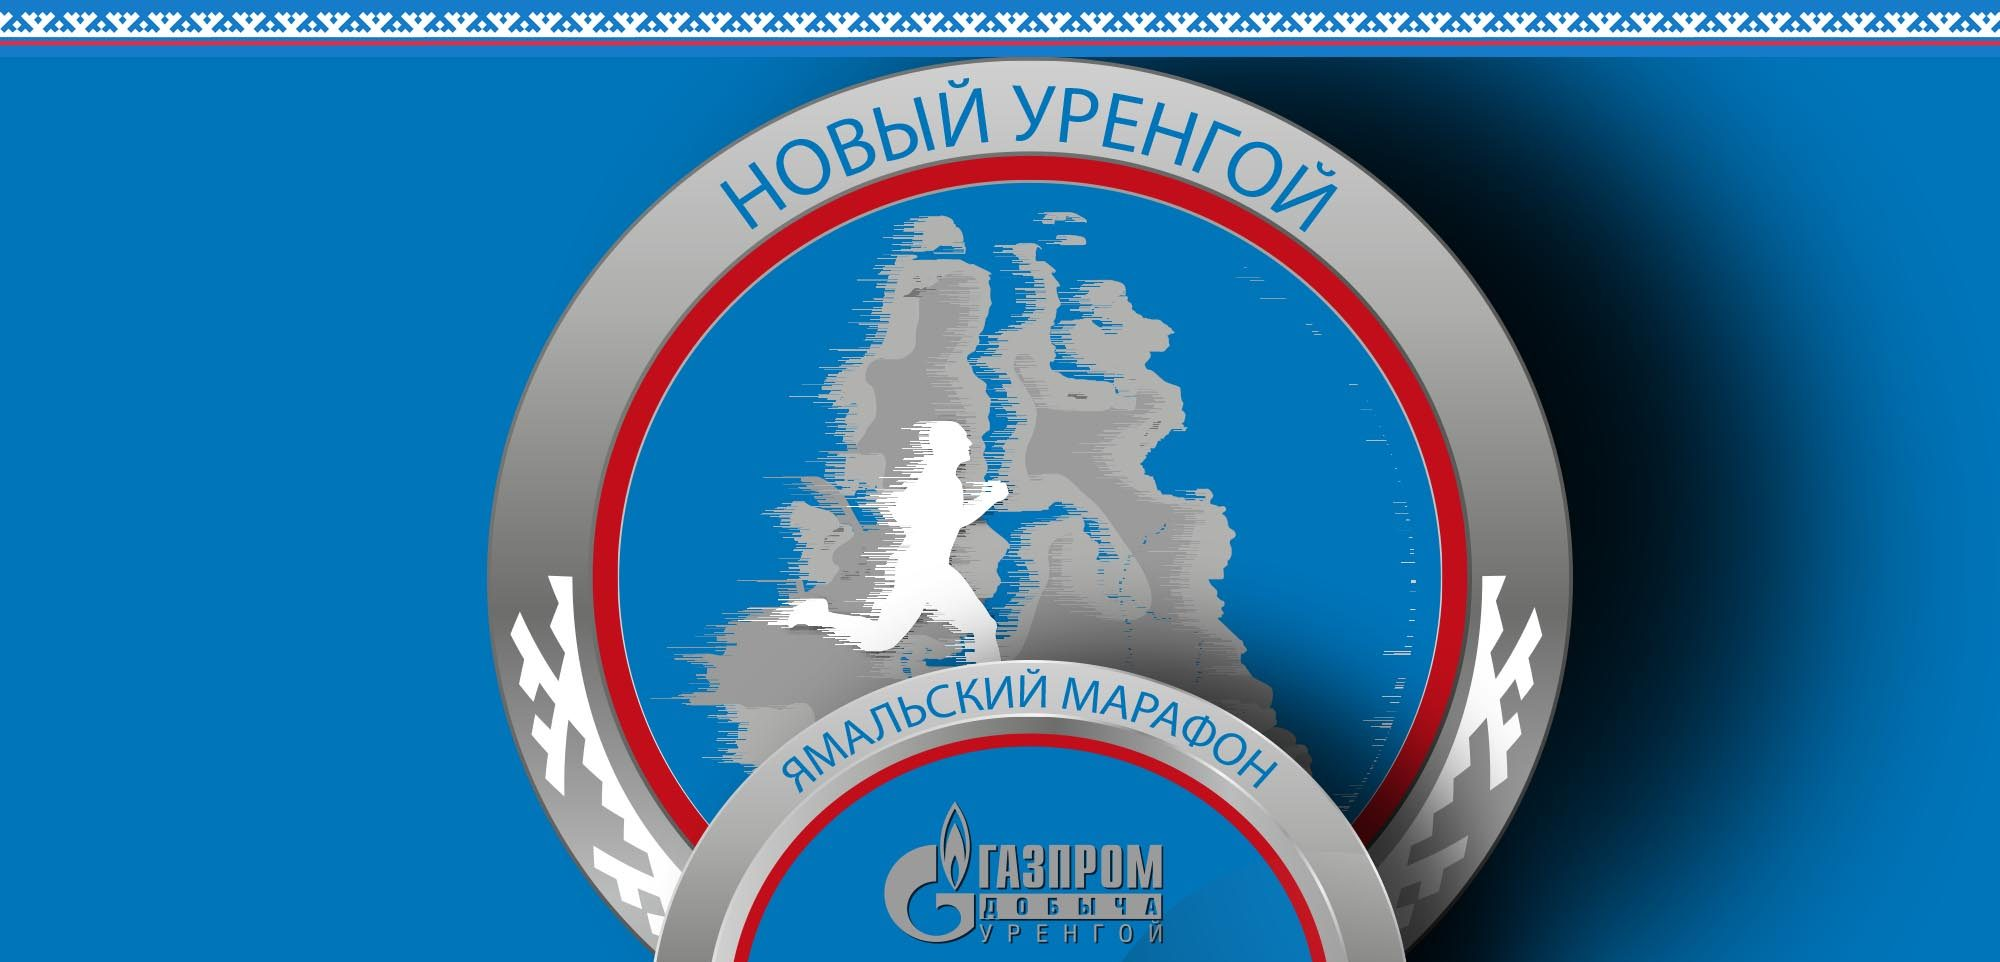 Ямальский марафон